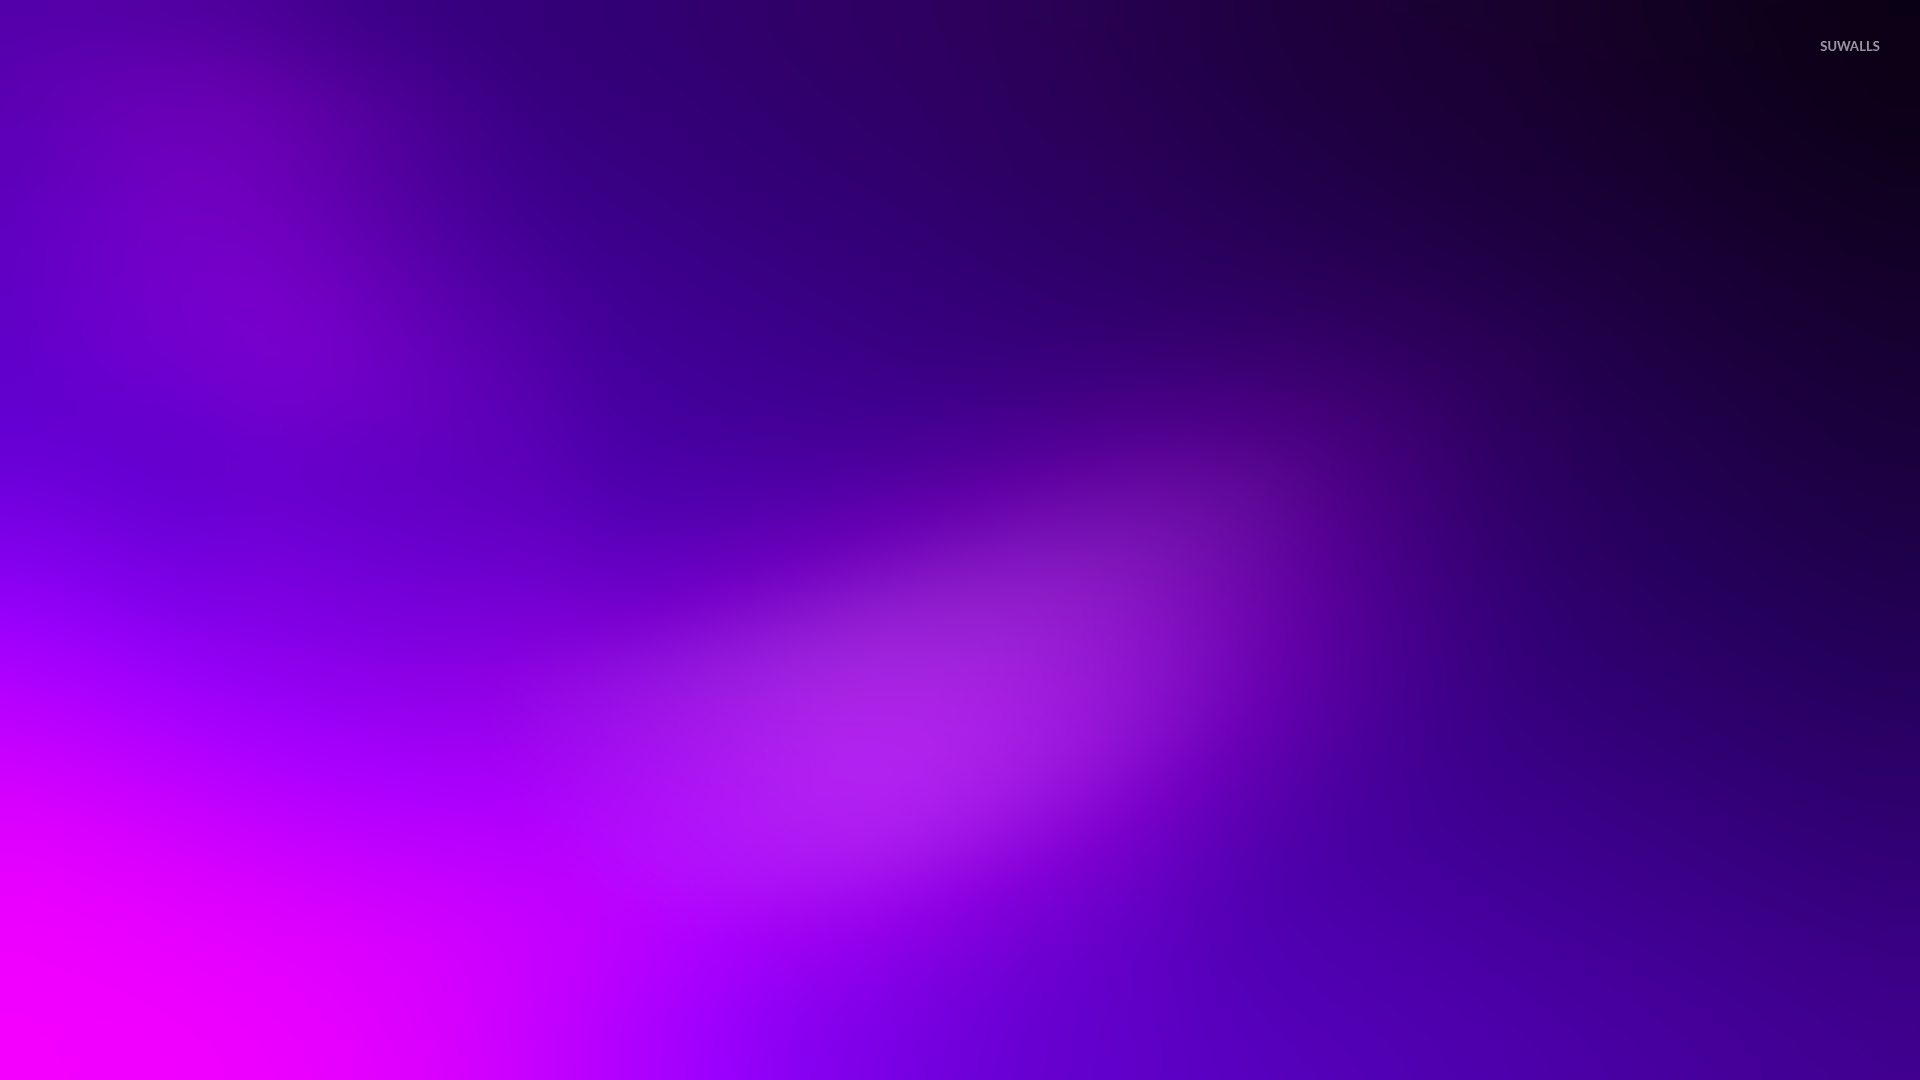 purple fog wallpaper free - photo #2